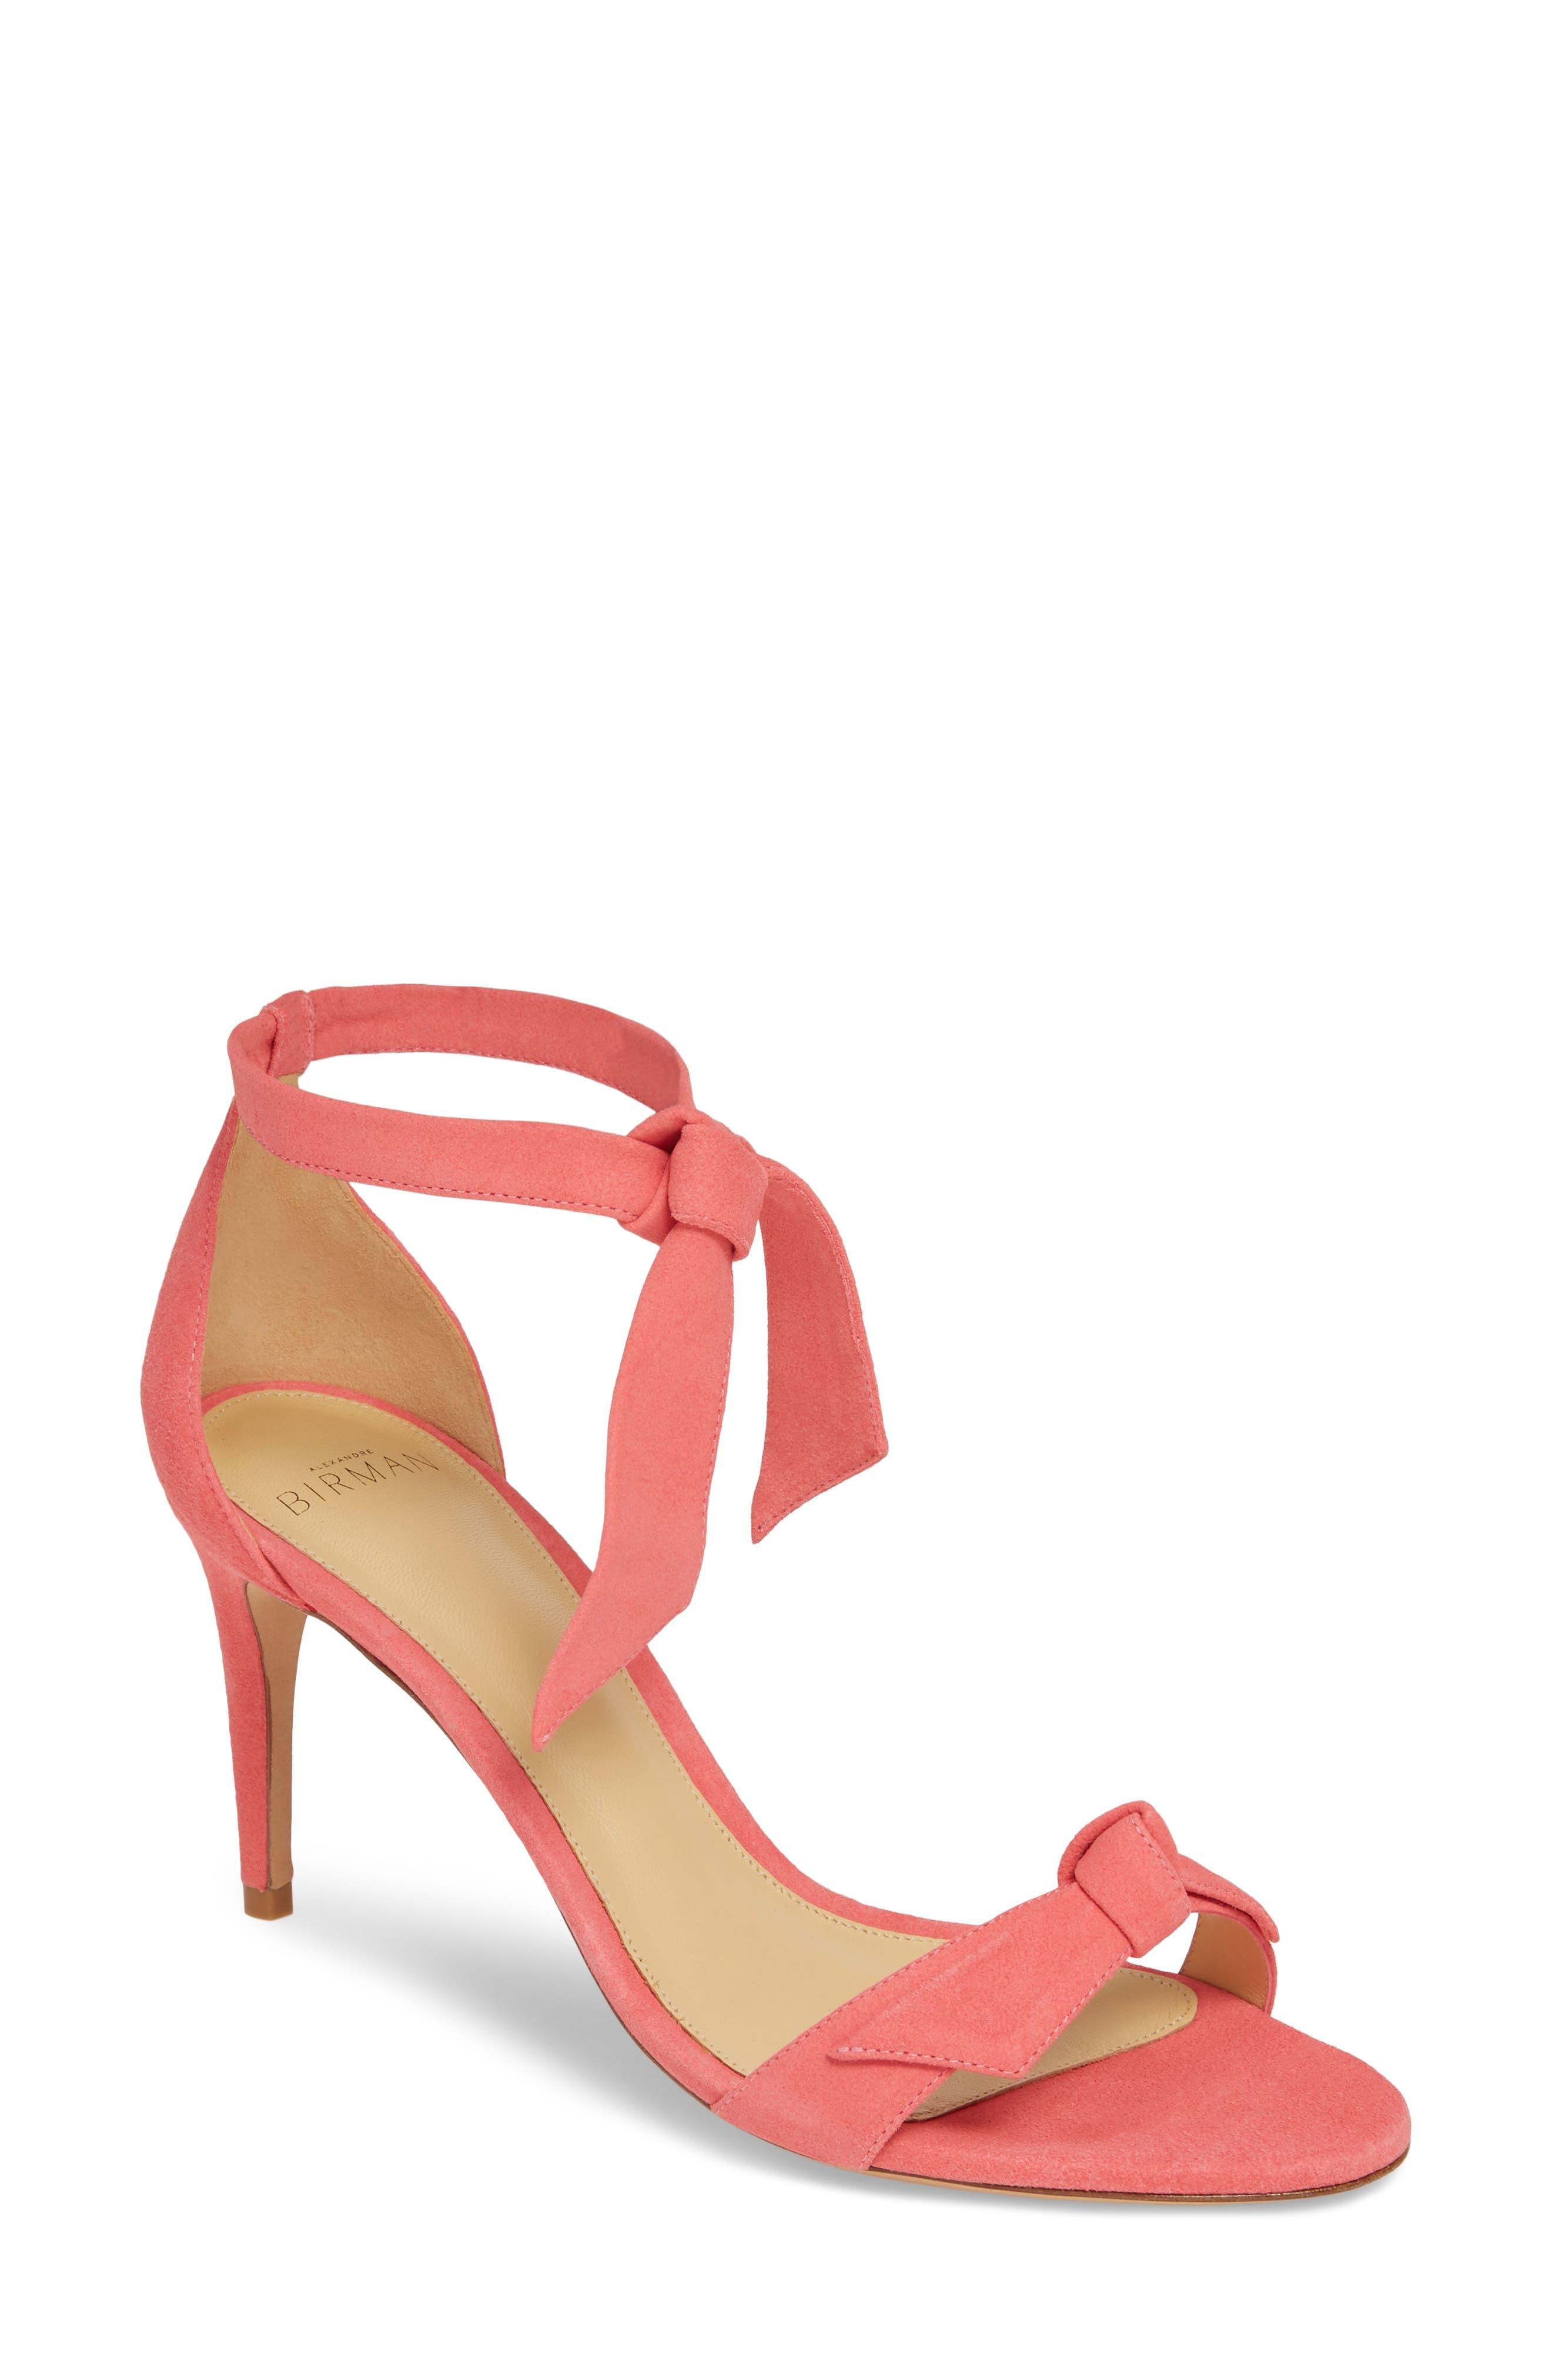 Alexandre Birman Clarita Ankle Tie Sandal- Pink